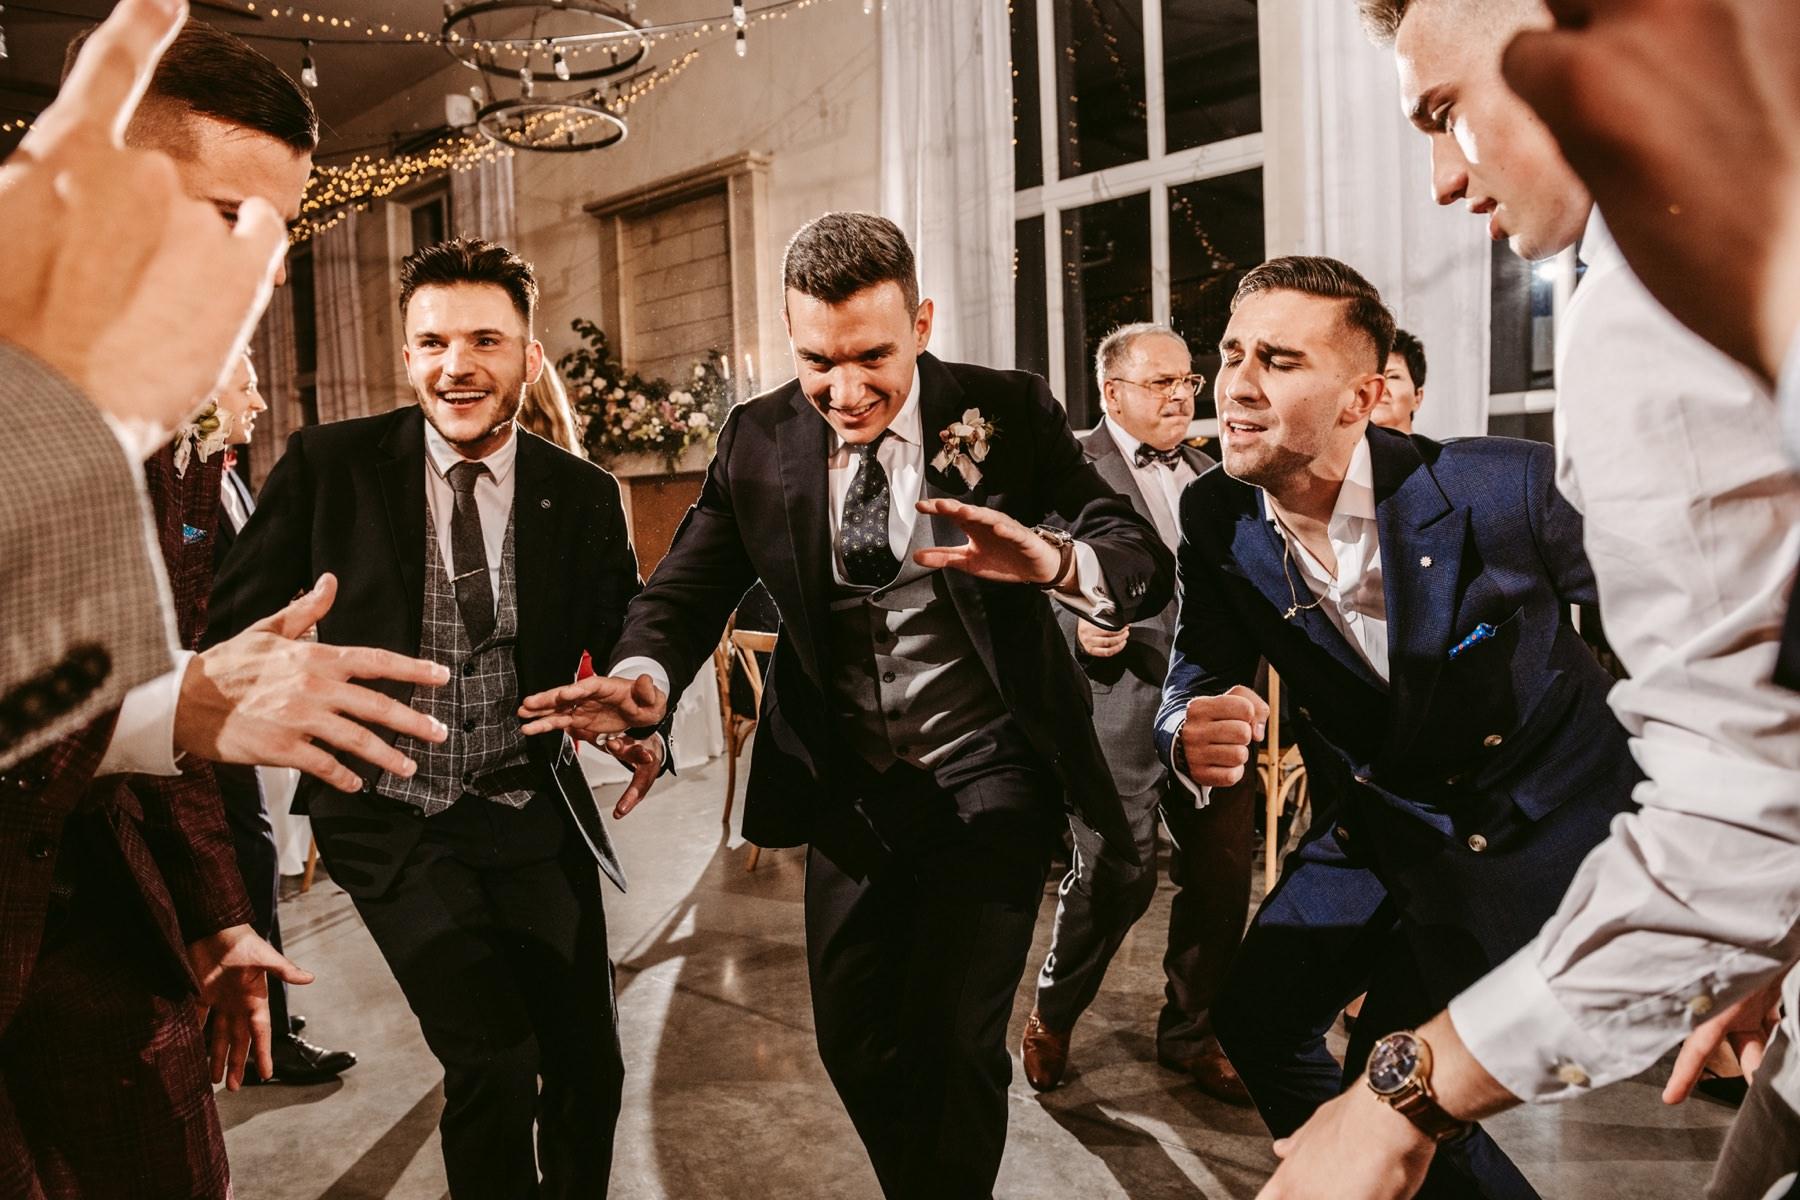 wesele villa love, wesele w villa love, sala weselna izdebnik, najpiekniejsze miejsca na organizacje wesela, fotograf slubny, fotografia slubna, fotograf slubny krakow, zdjecia slubne krakow, villa love, villa love izdebnik, romantyczne wesele w villa love, izdebnik sala weselna, villa love wesele